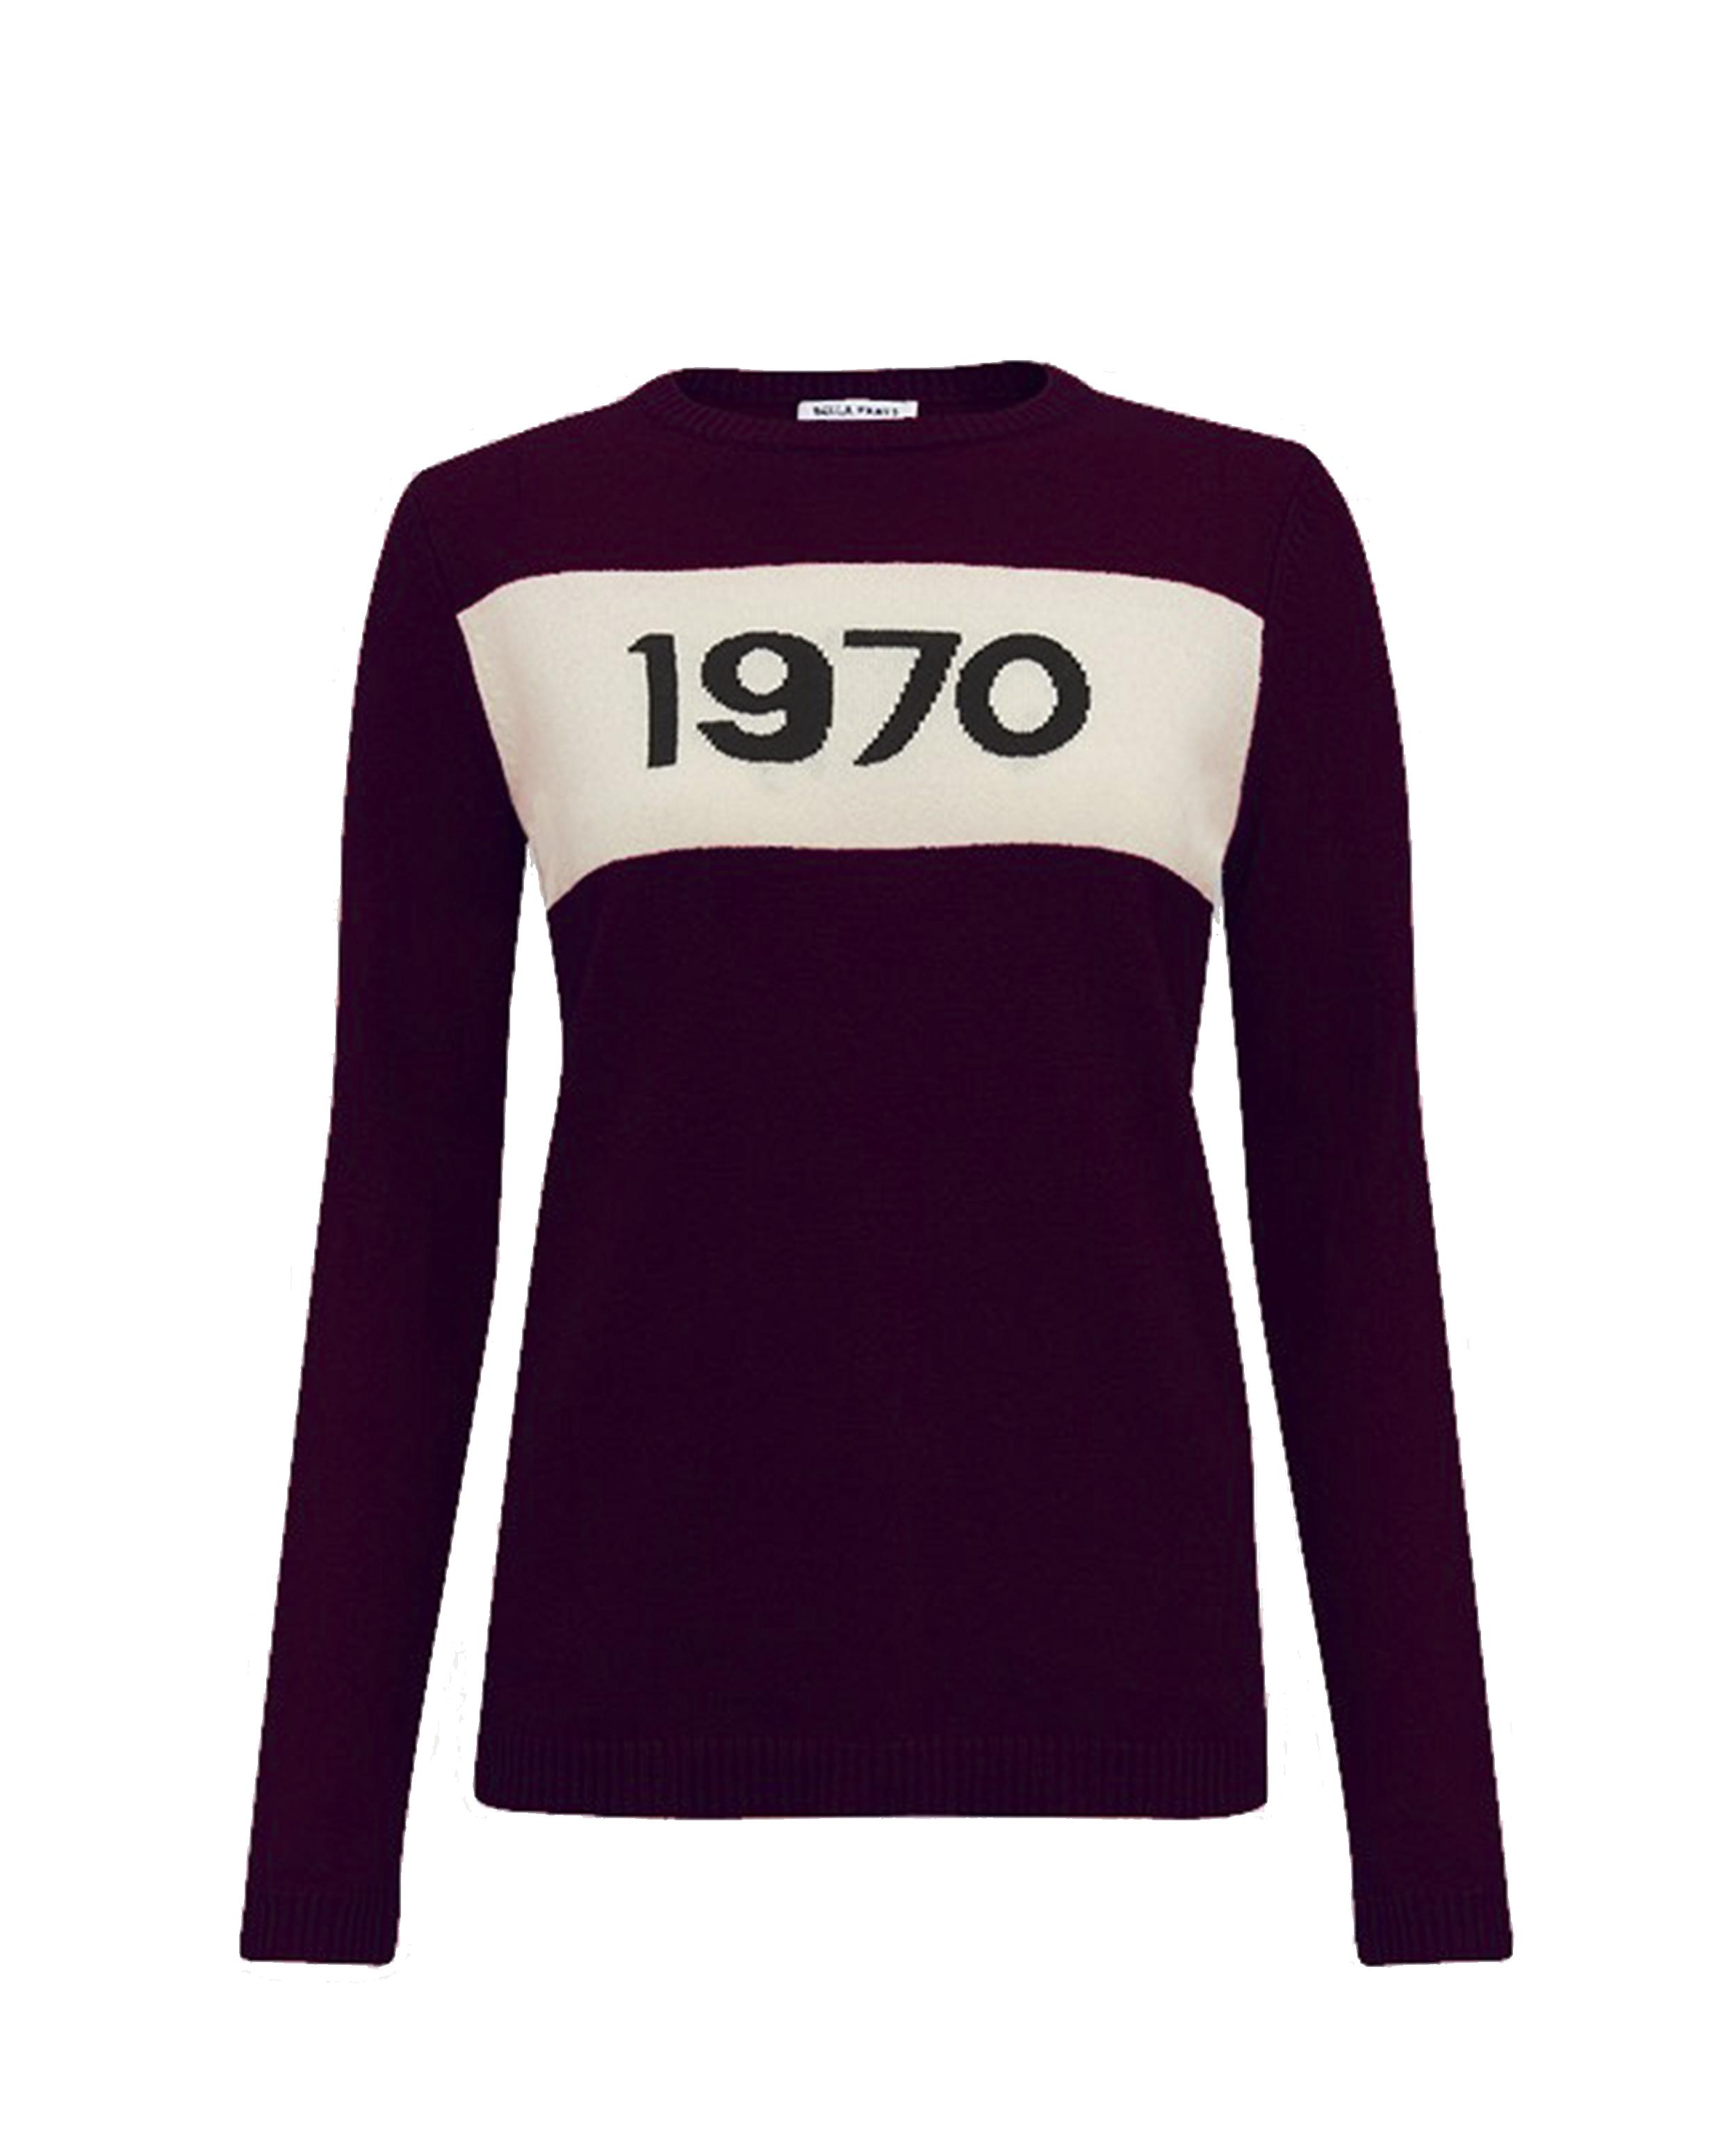 Bella Freud 2 - 1970 Merino Jumper - Burgundy